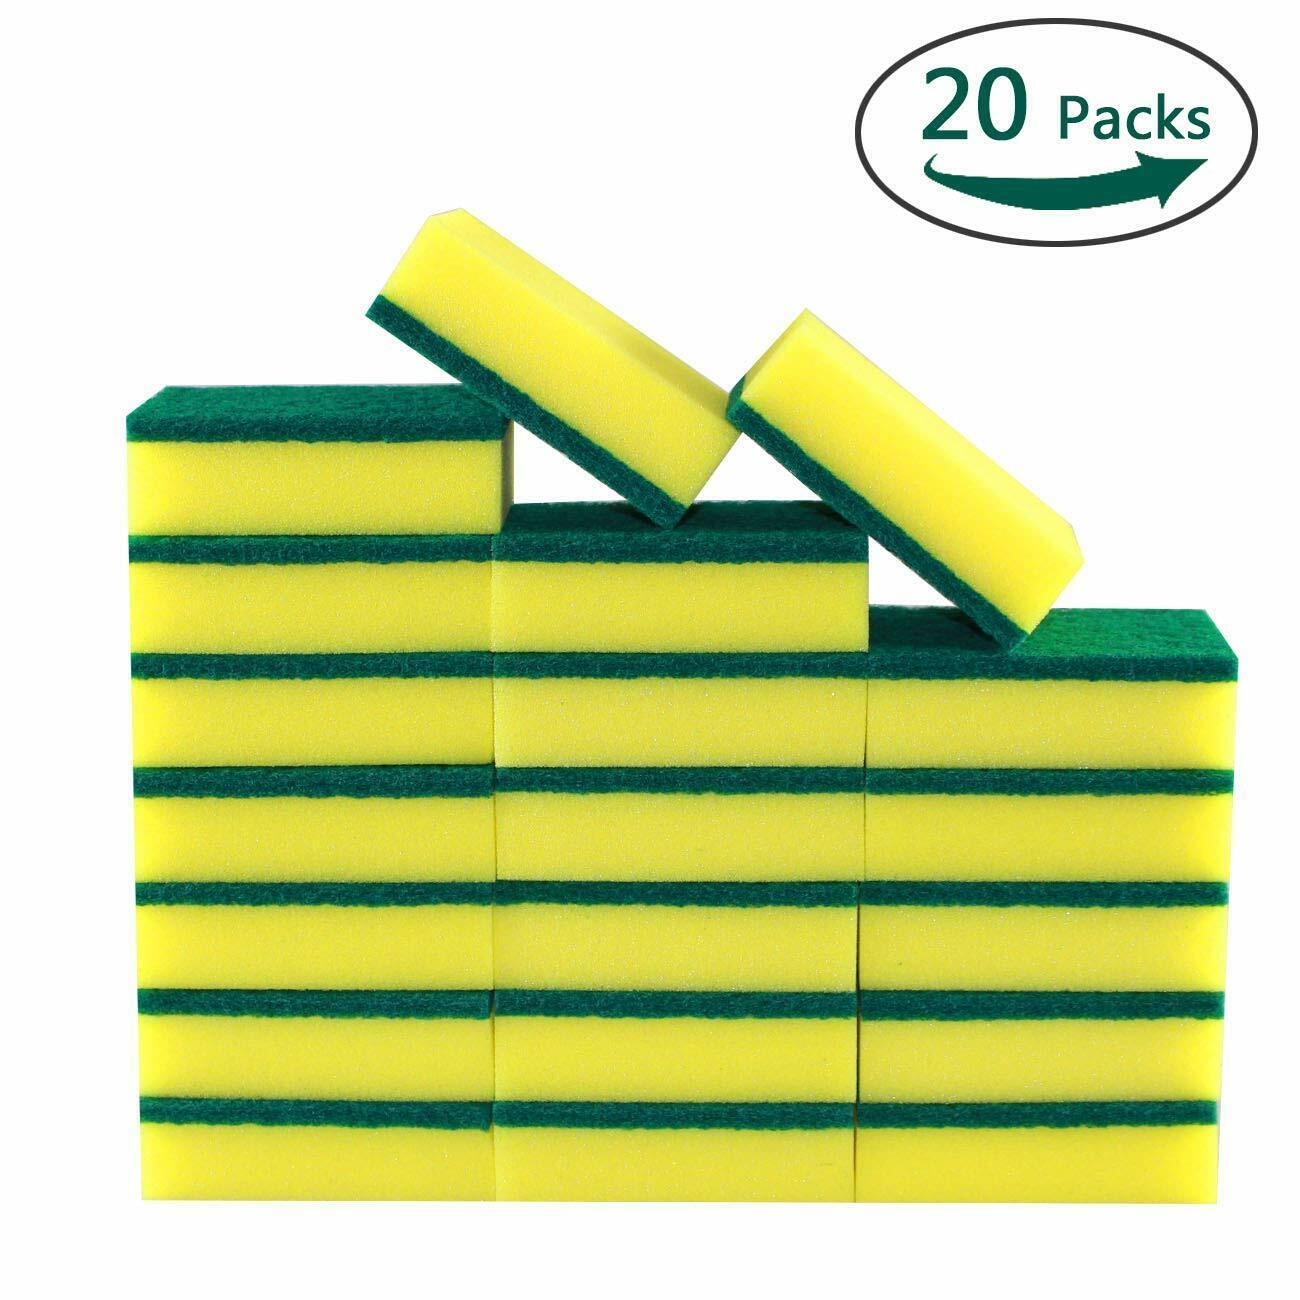 Nuvalu Multi-Use Cleaning Sponges Scrub - Non-Scratch Eraser Sponge - 20 Pack